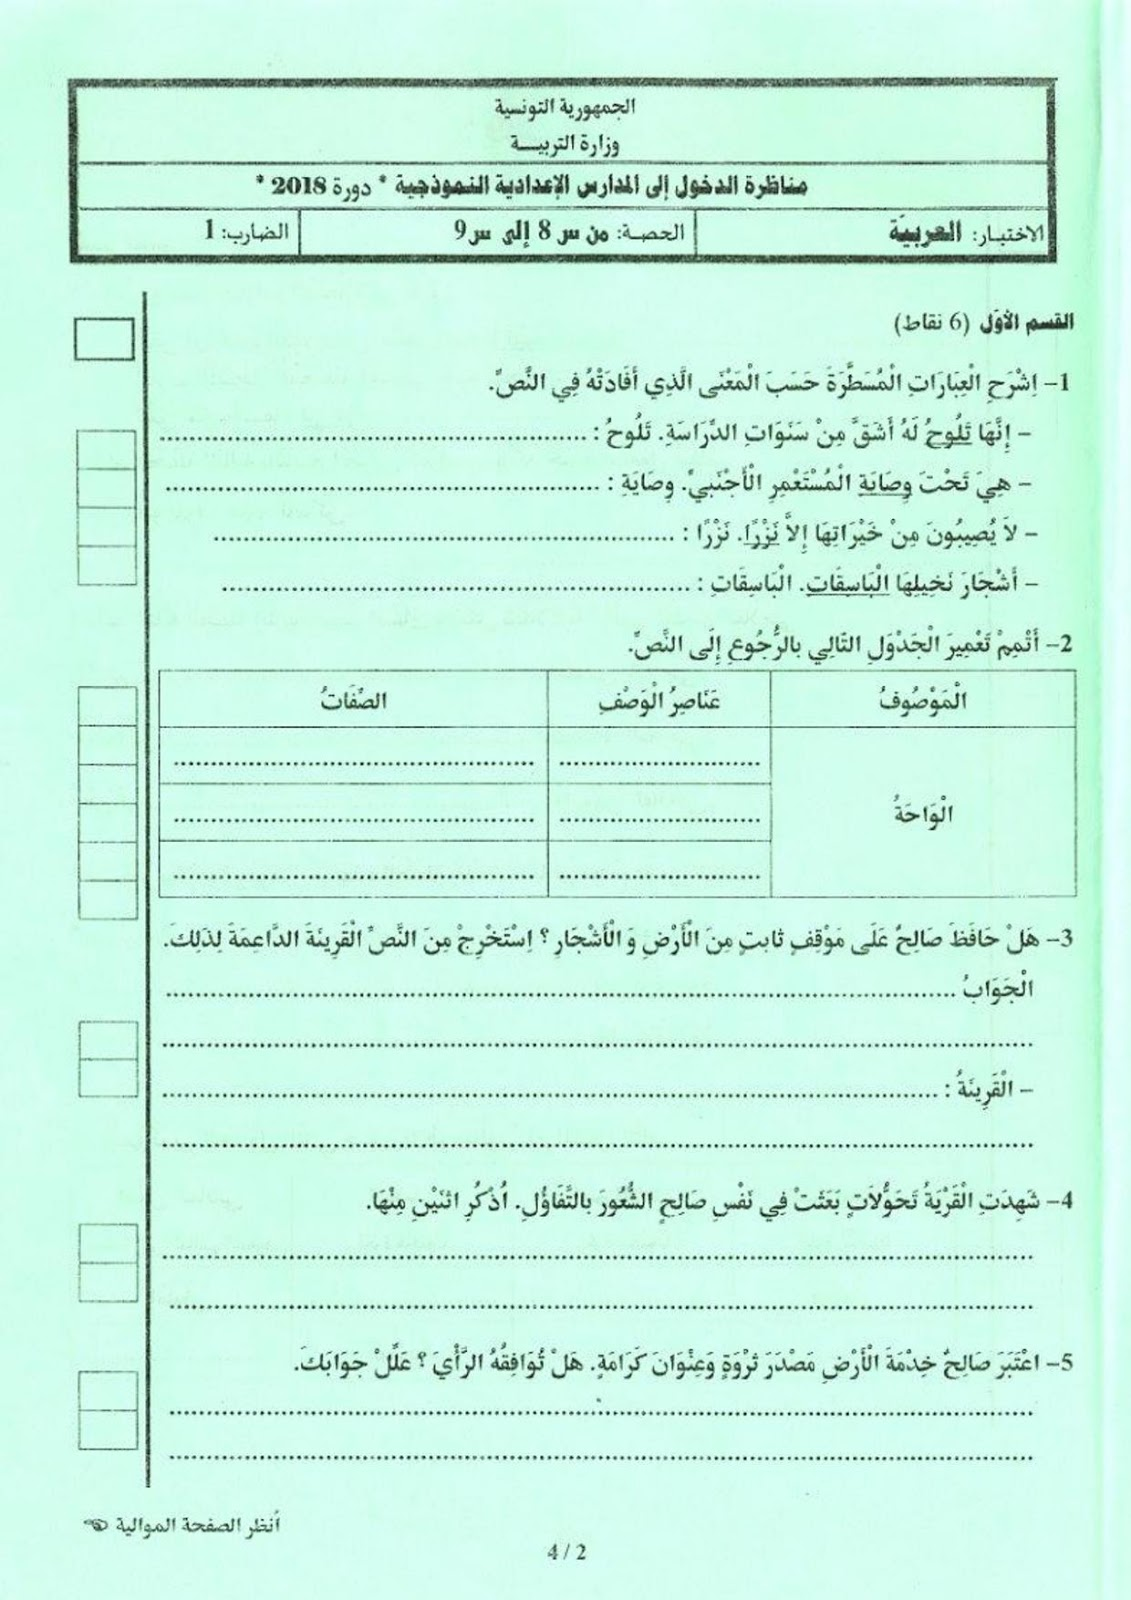 arabe page 002 - إختبارات اليوم الأول مع الإصلاح سيزيام 2018 عربية و انجليزية